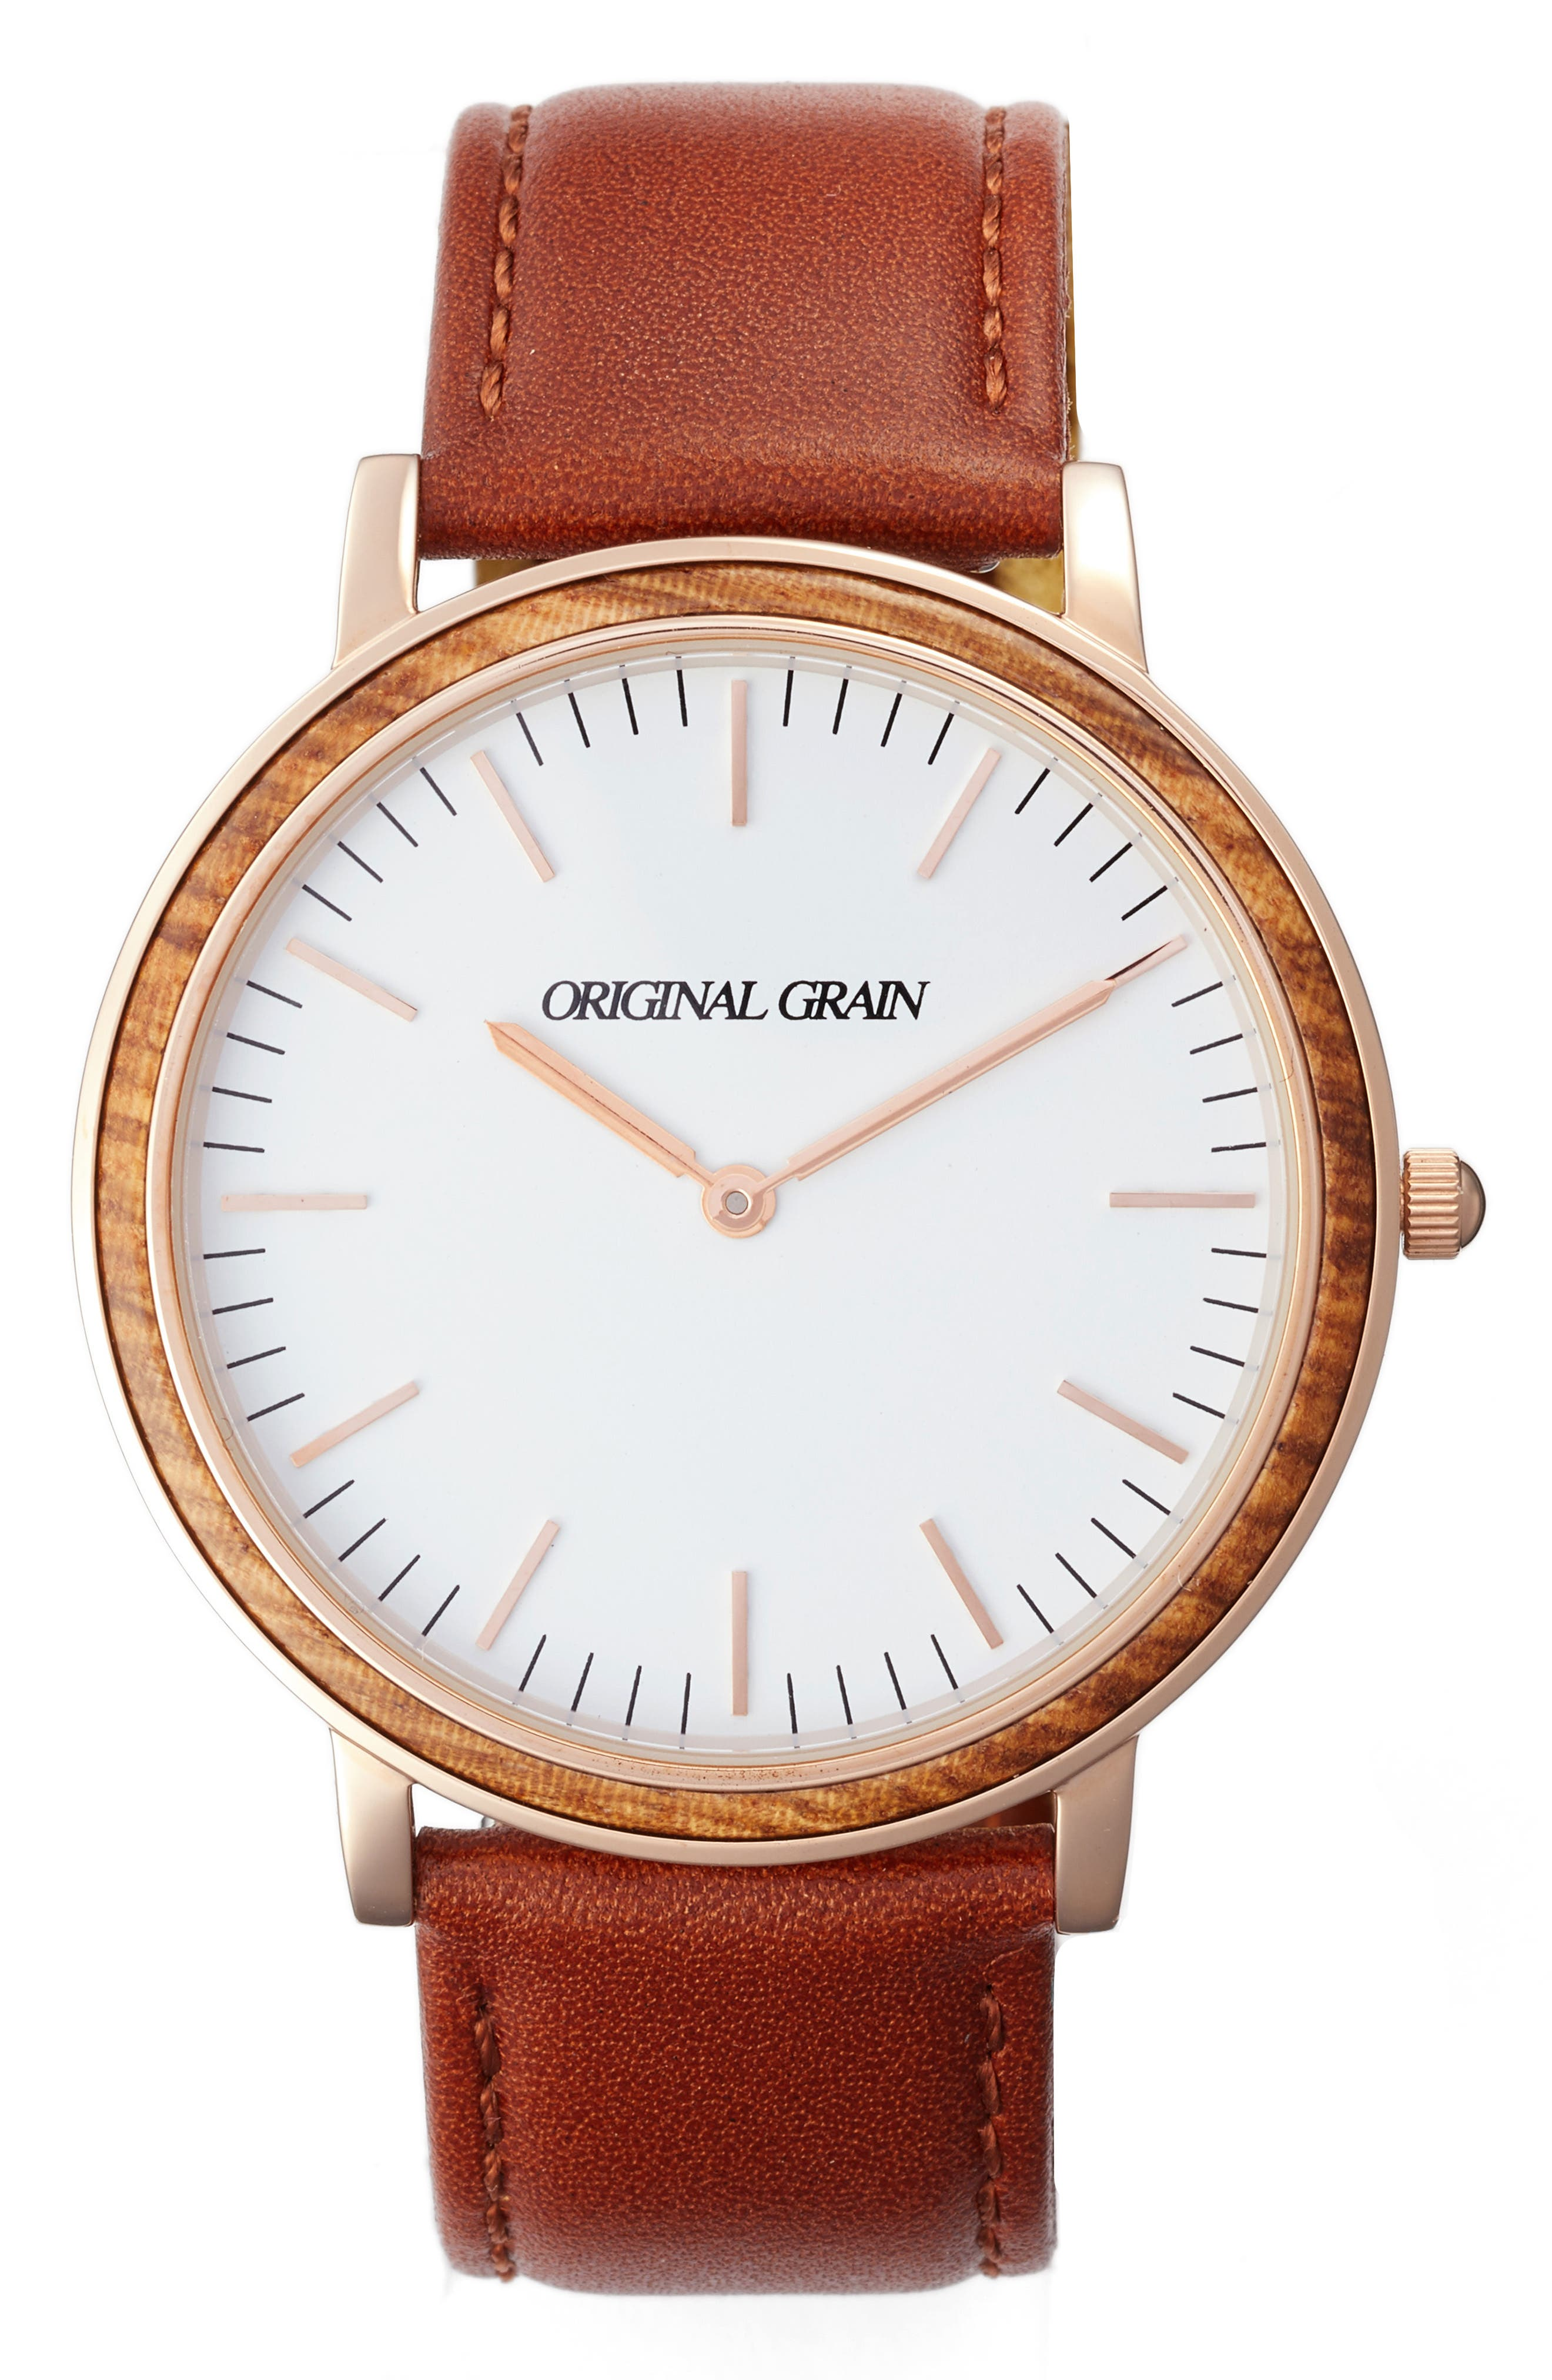 Alternate Image 1 Selected - Original Grain Minimalist Leather Strap Watch, 40mm